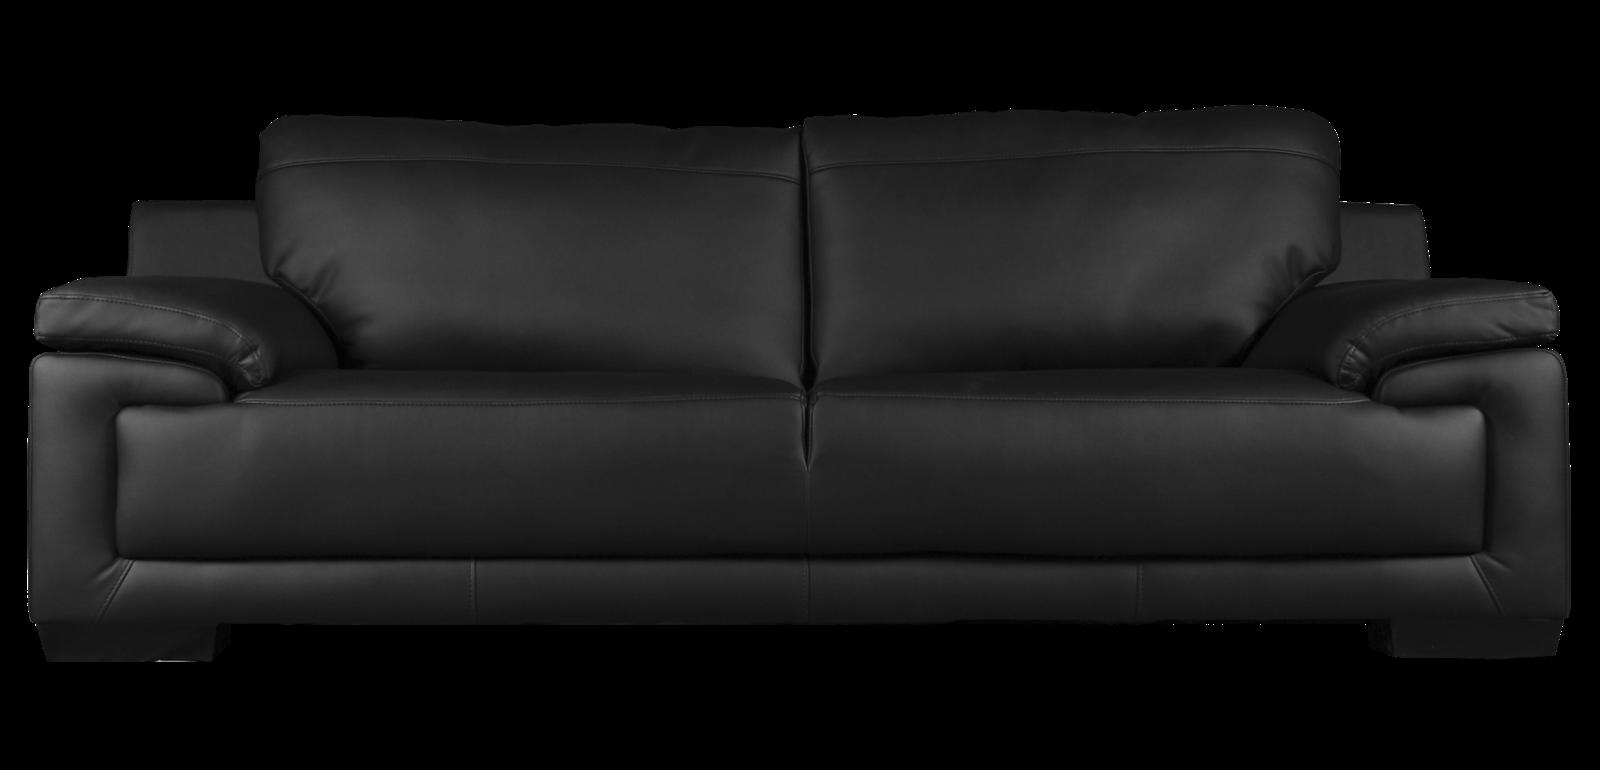 Black Sofa PNG Image - PurePNG | Free transparent CC0 PNG ...